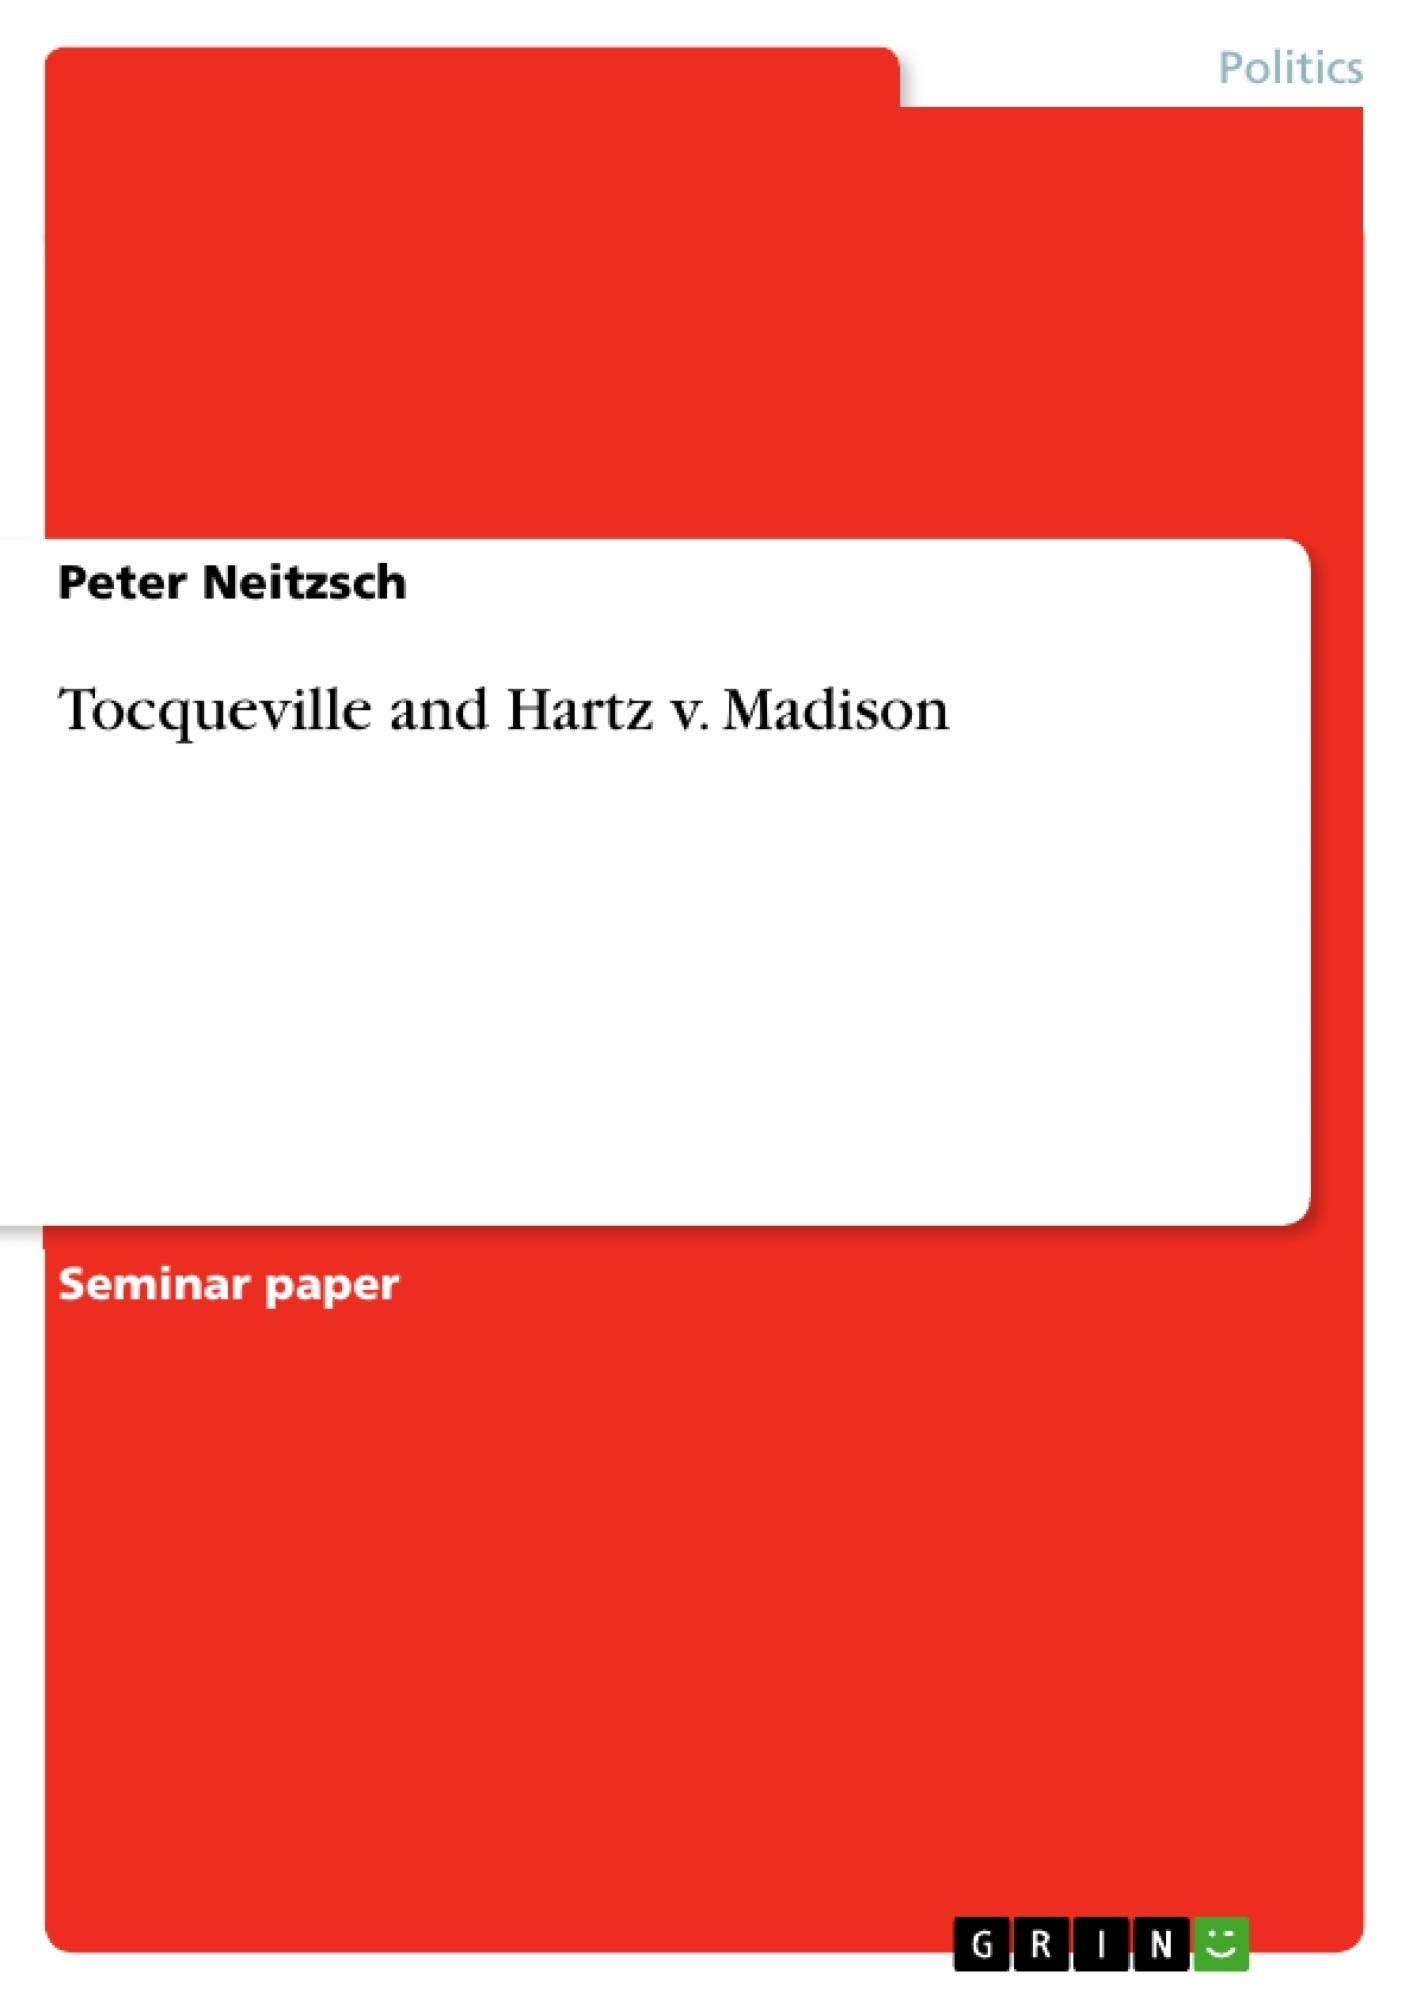 Title: Tocqueville and Hartz v. Madison